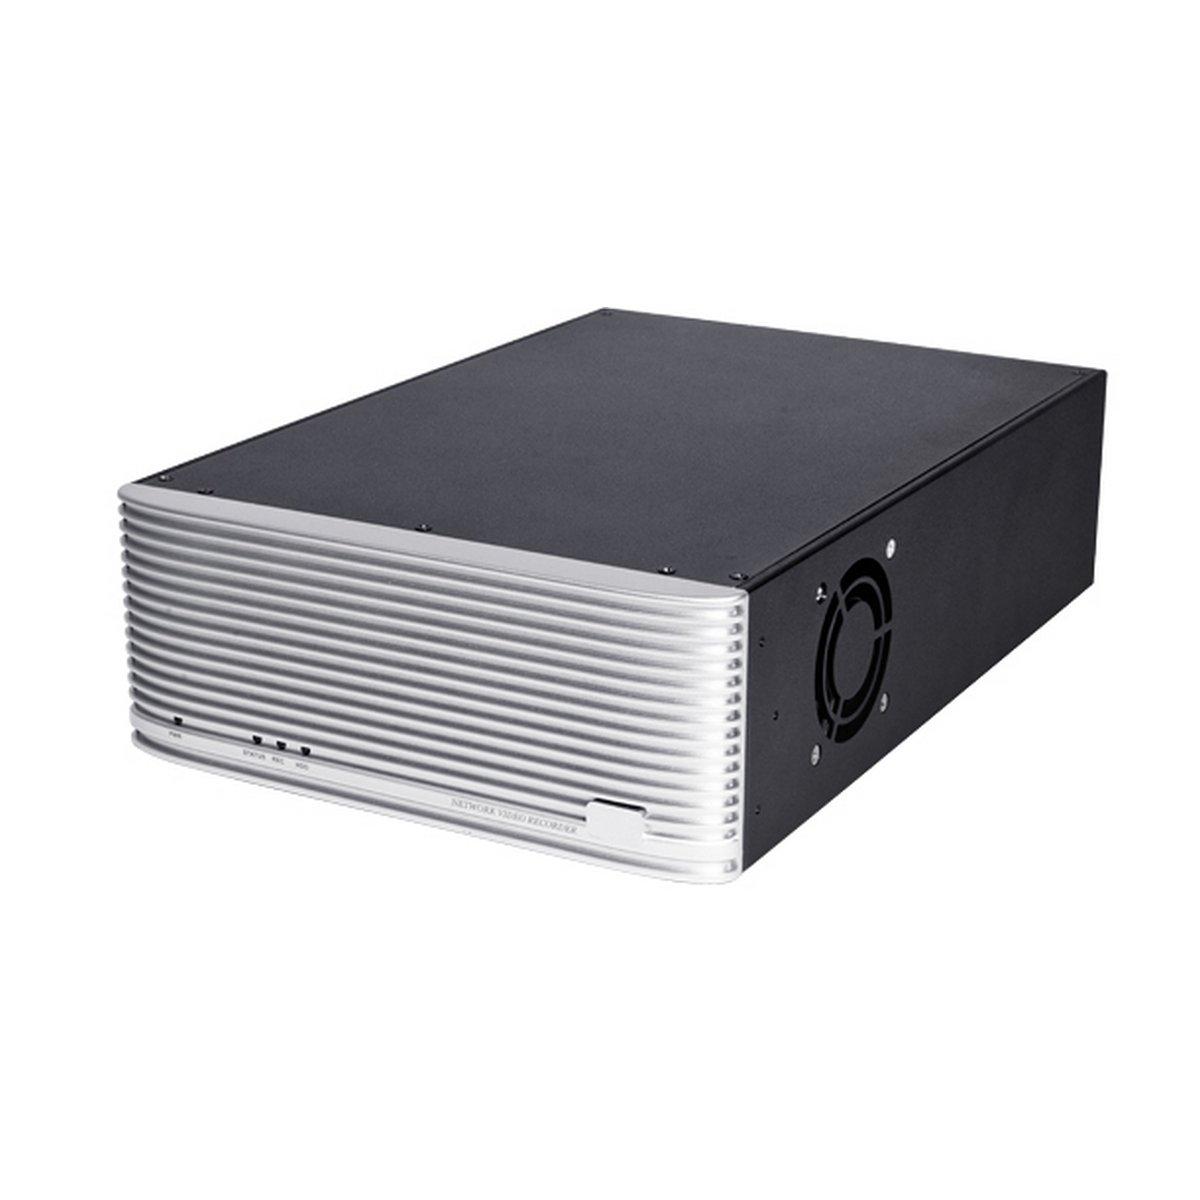 Marshall Electronics VS-NVR-910-1TB | Standalone 9 Channel Network Video Recorder 1TB Storage